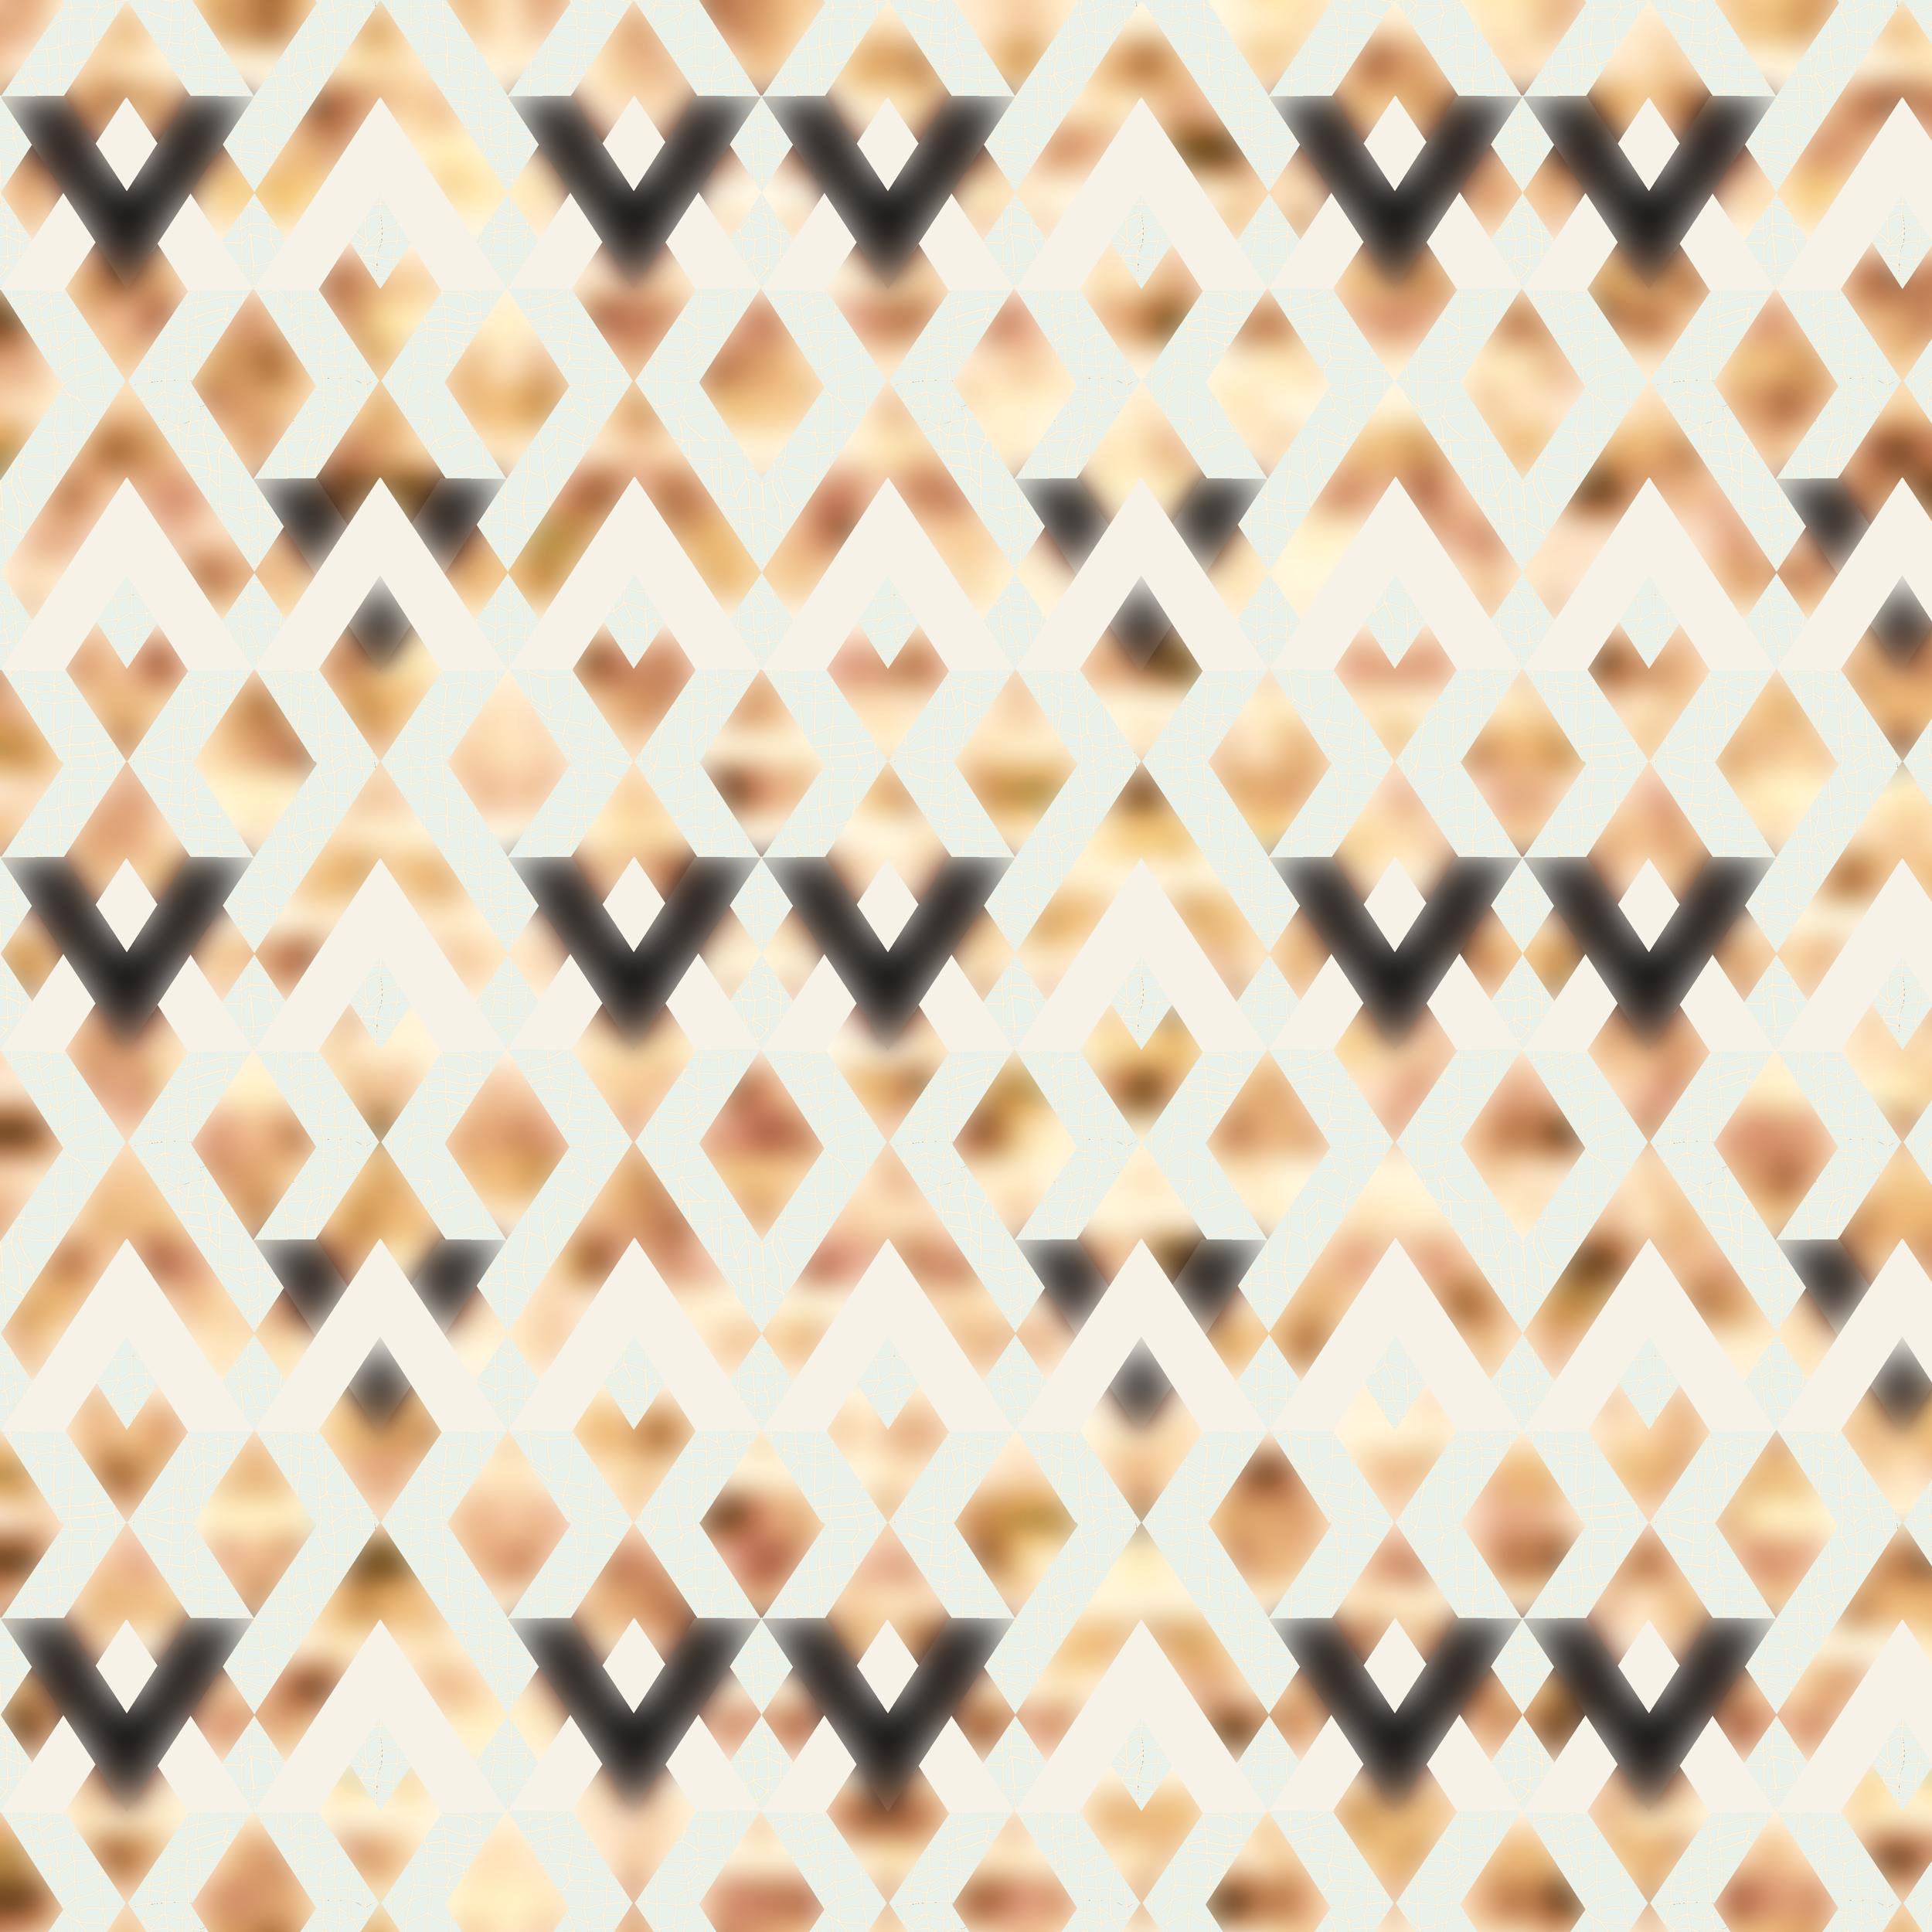 GeometricGiraffe.png